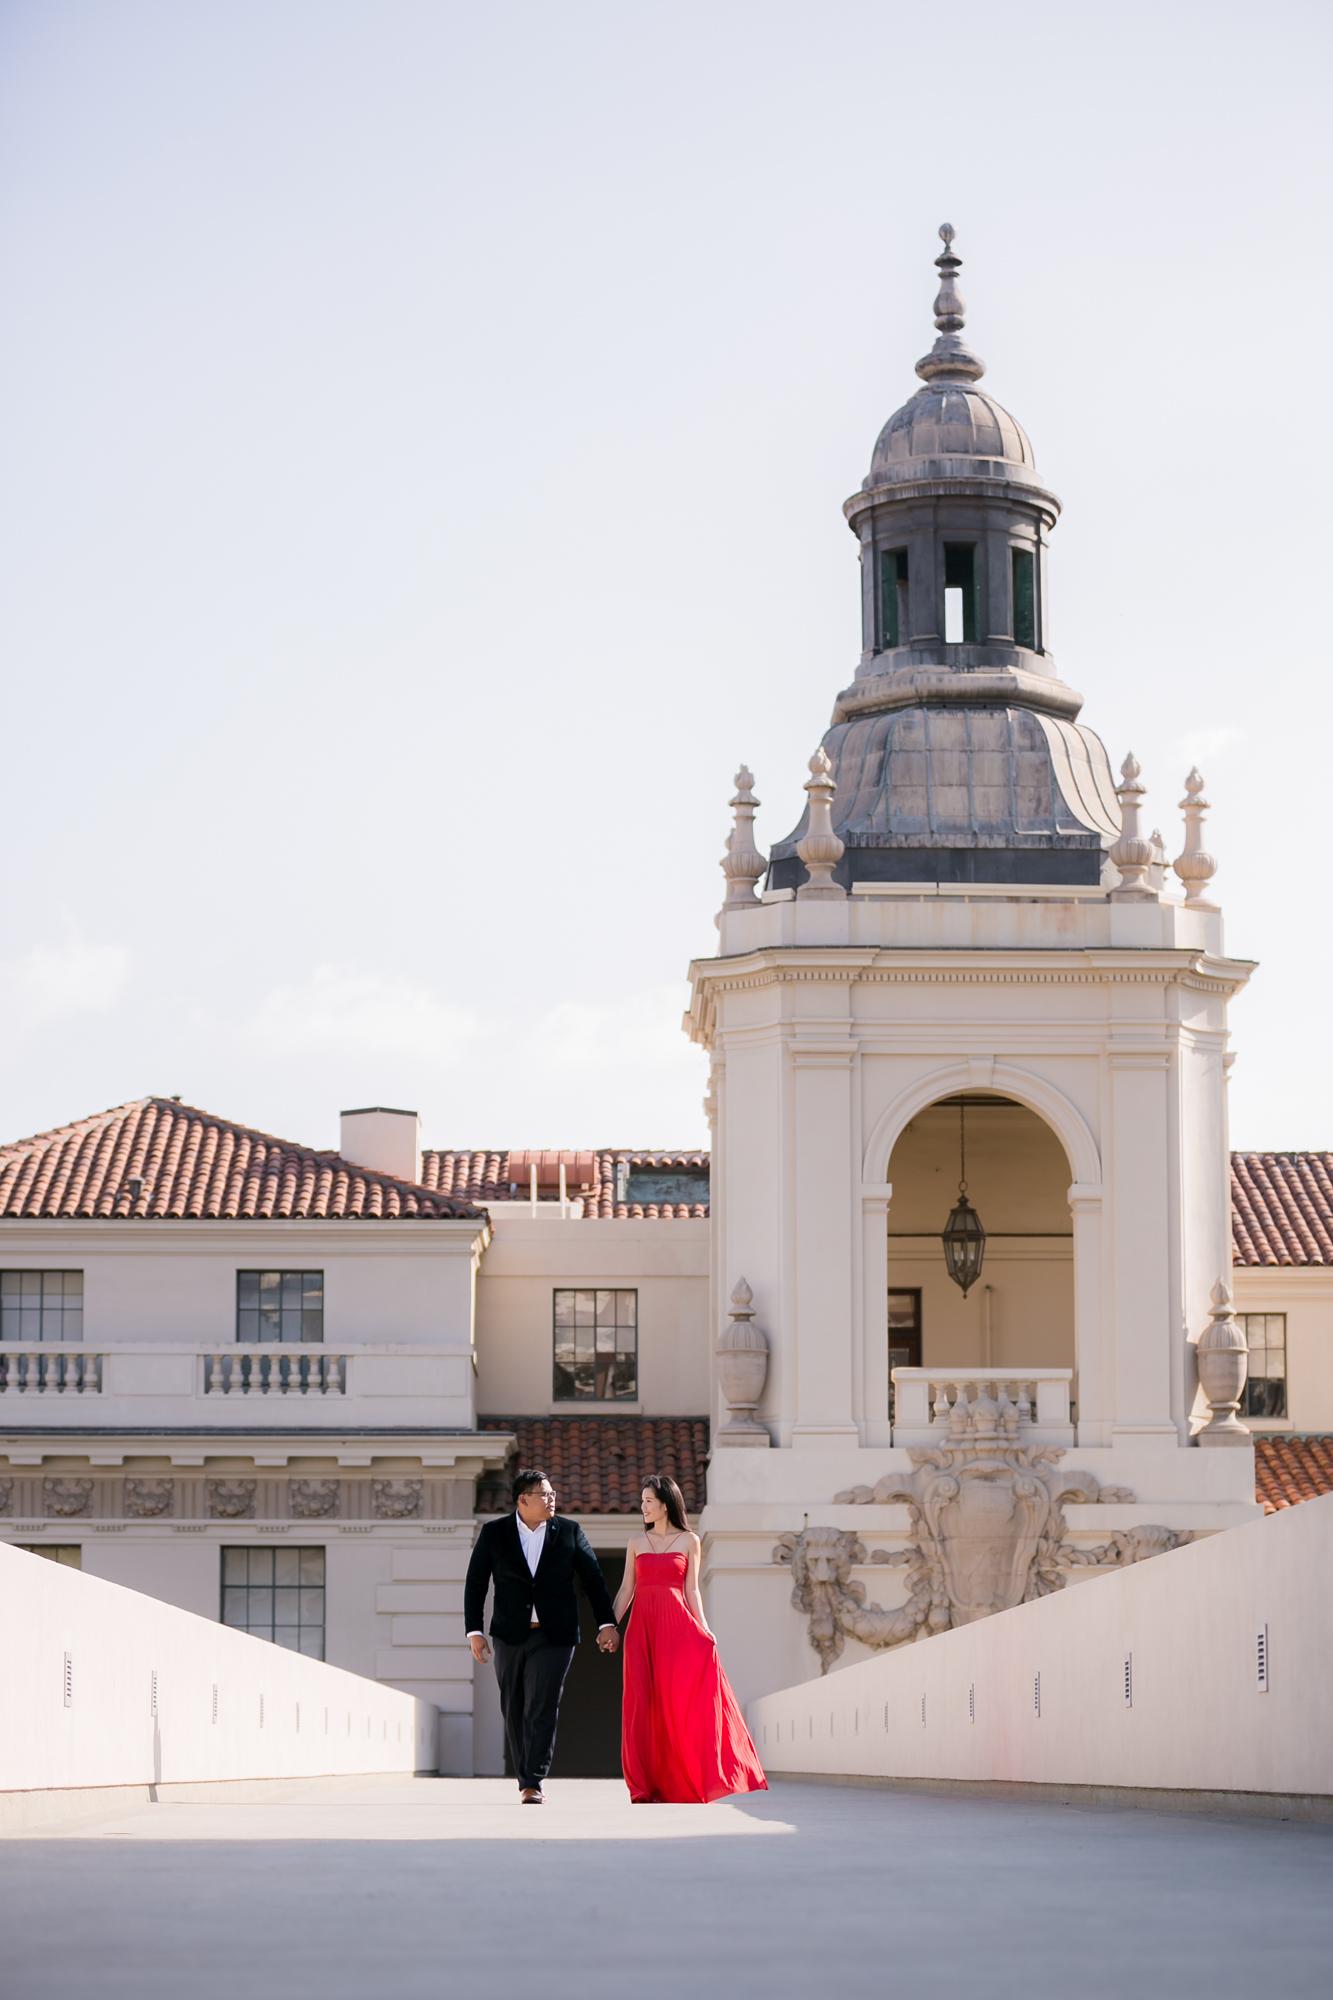 CM-Pasadena_City-Hall-Engagement-Photography-0004.jpg